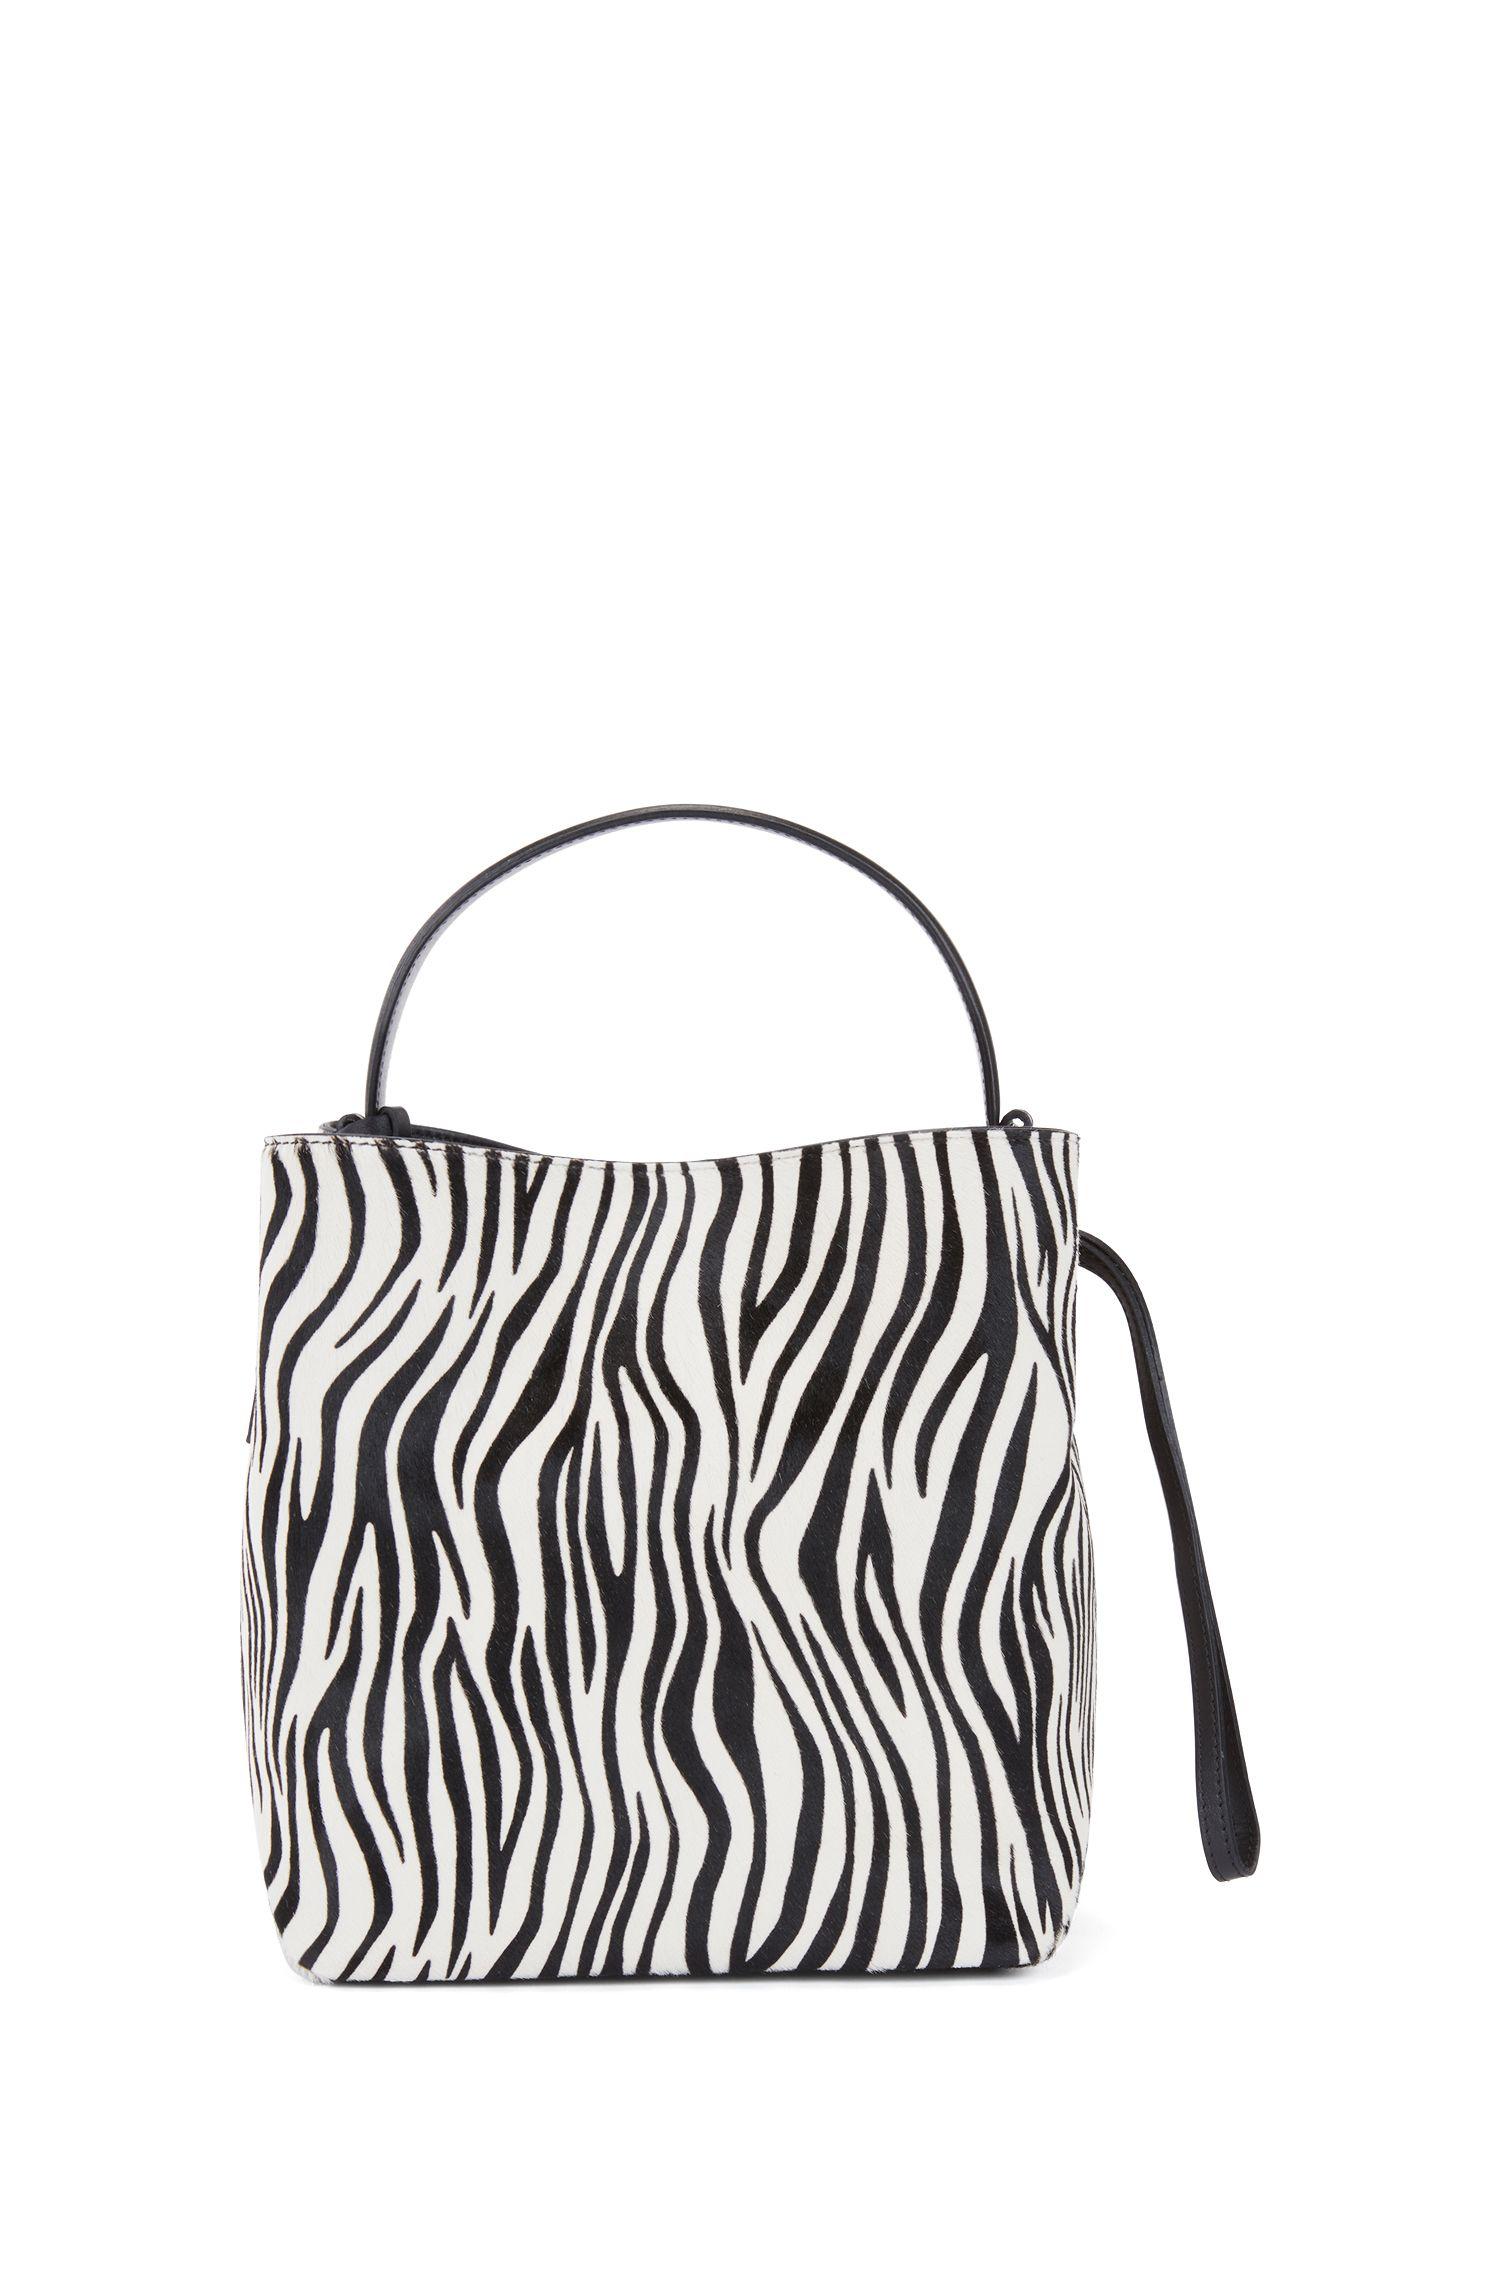 Gallery Collection bucket bag in zebra-print calf fur, Black